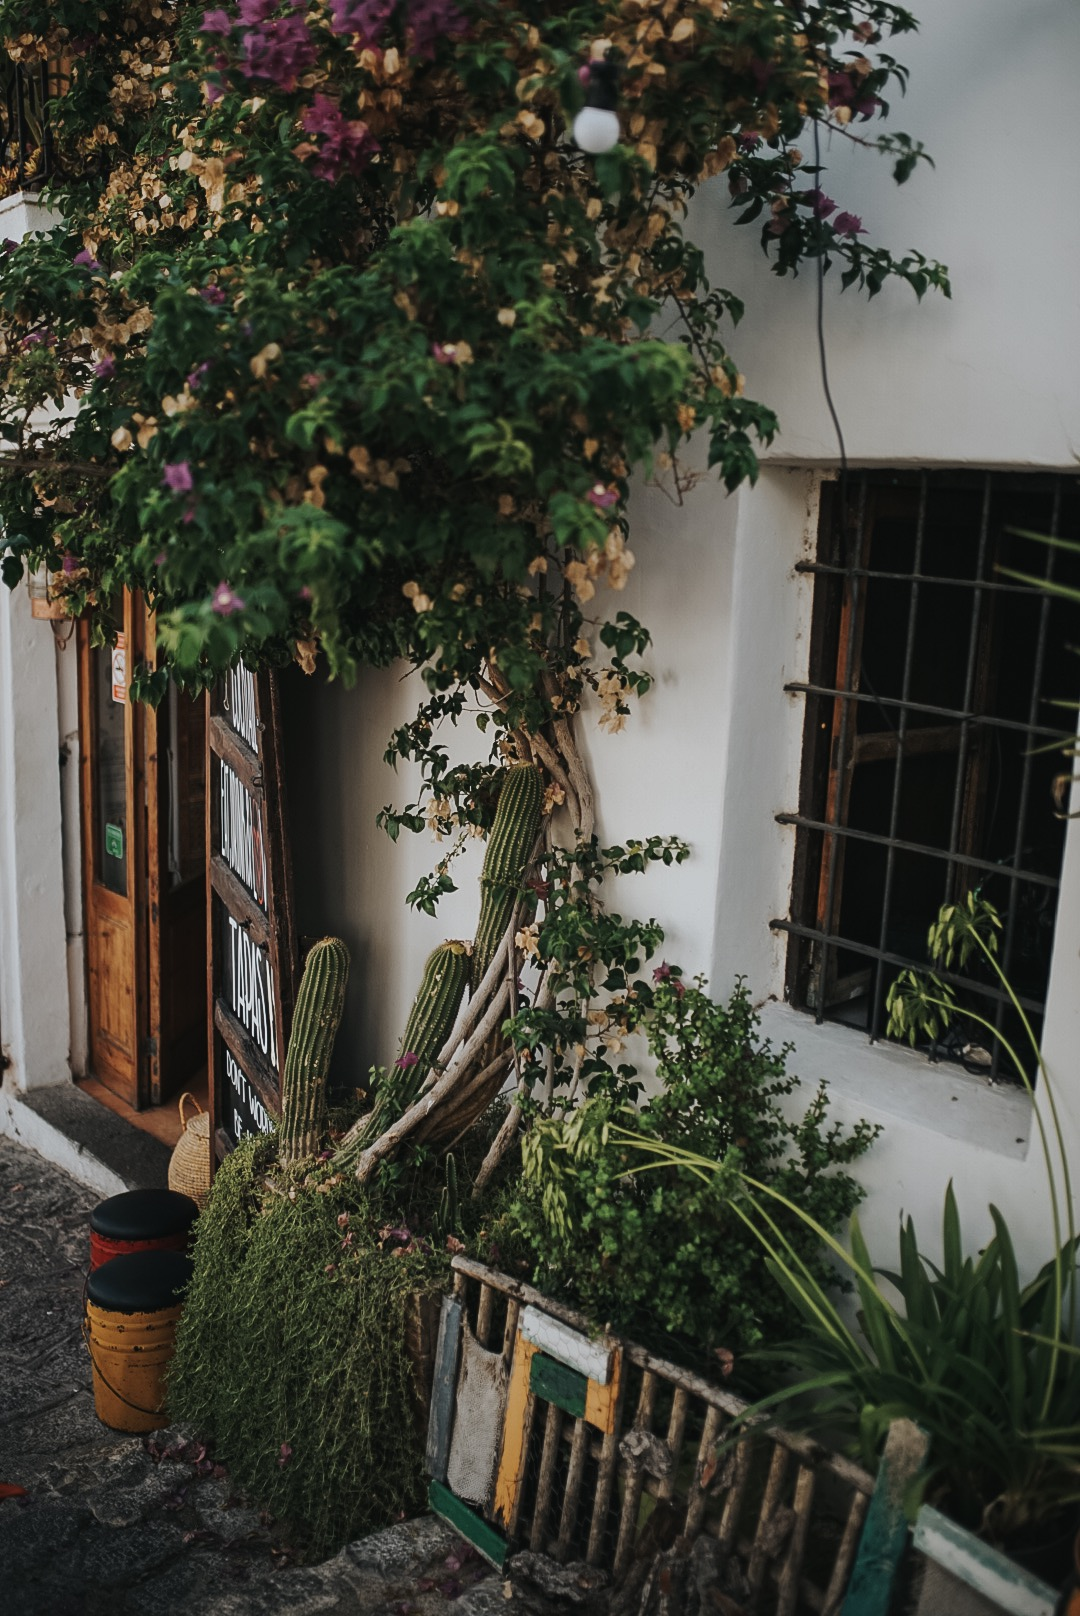 Dorisknowsfashion blog mode voyage bonnes adresses s'escalinata Ibiza